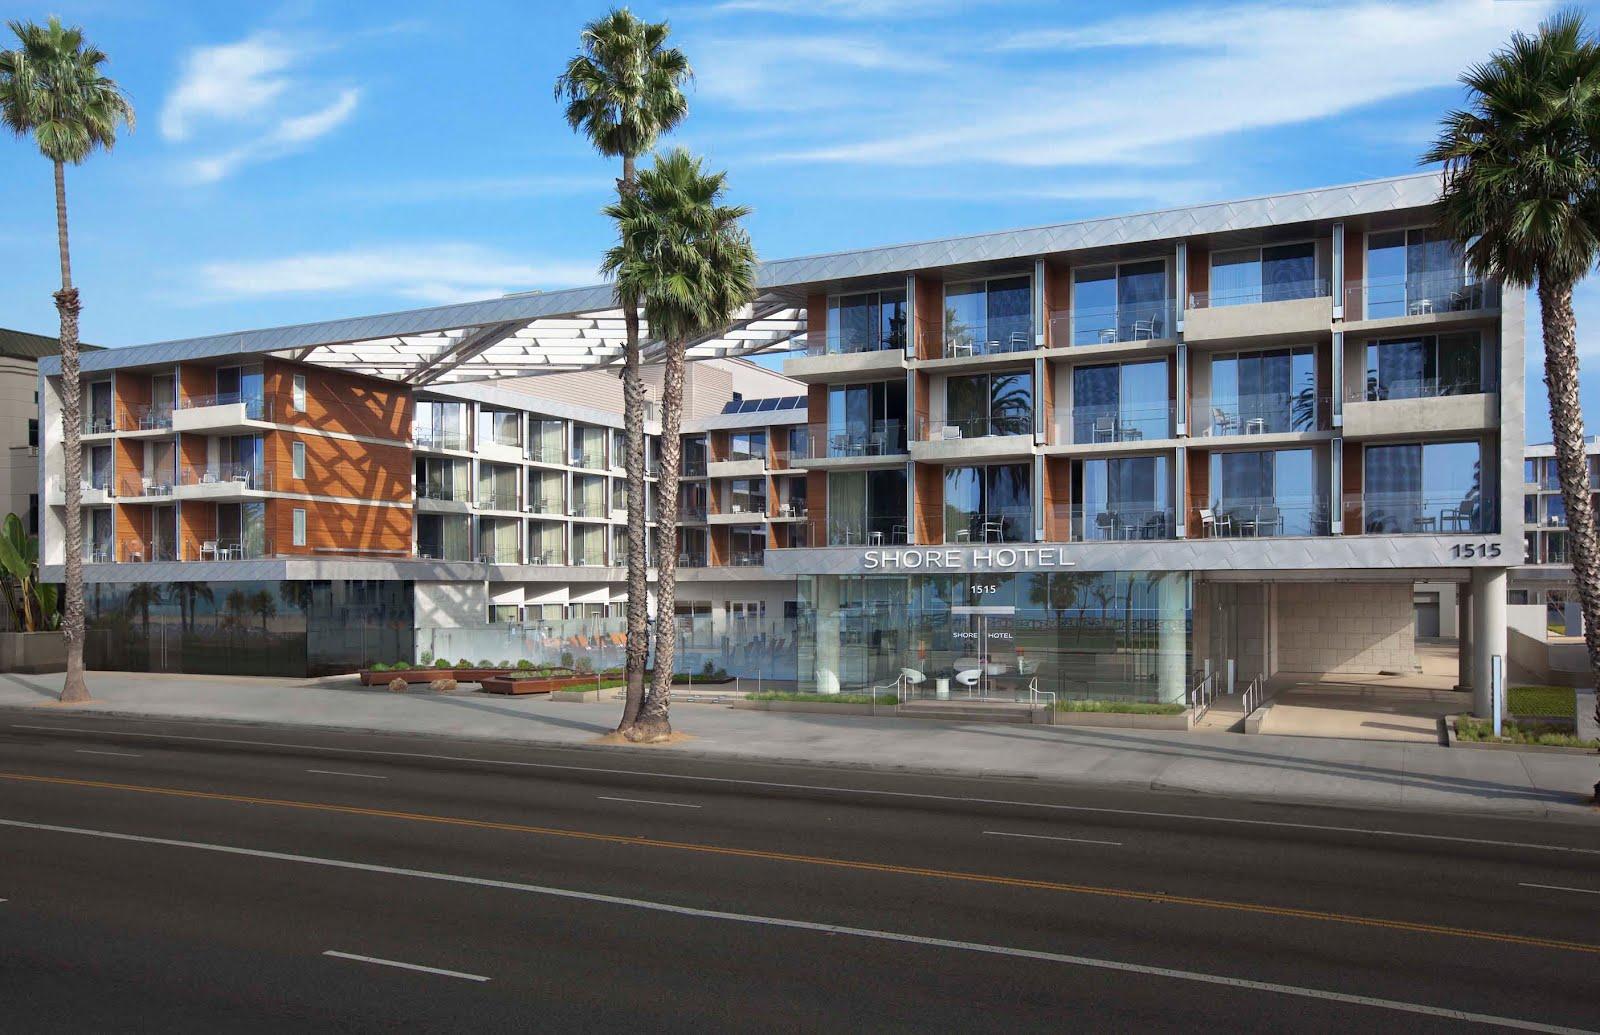 usgbc blog green hotel case study the shore hotel santa. Black Bedroom Furniture Sets. Home Design Ideas